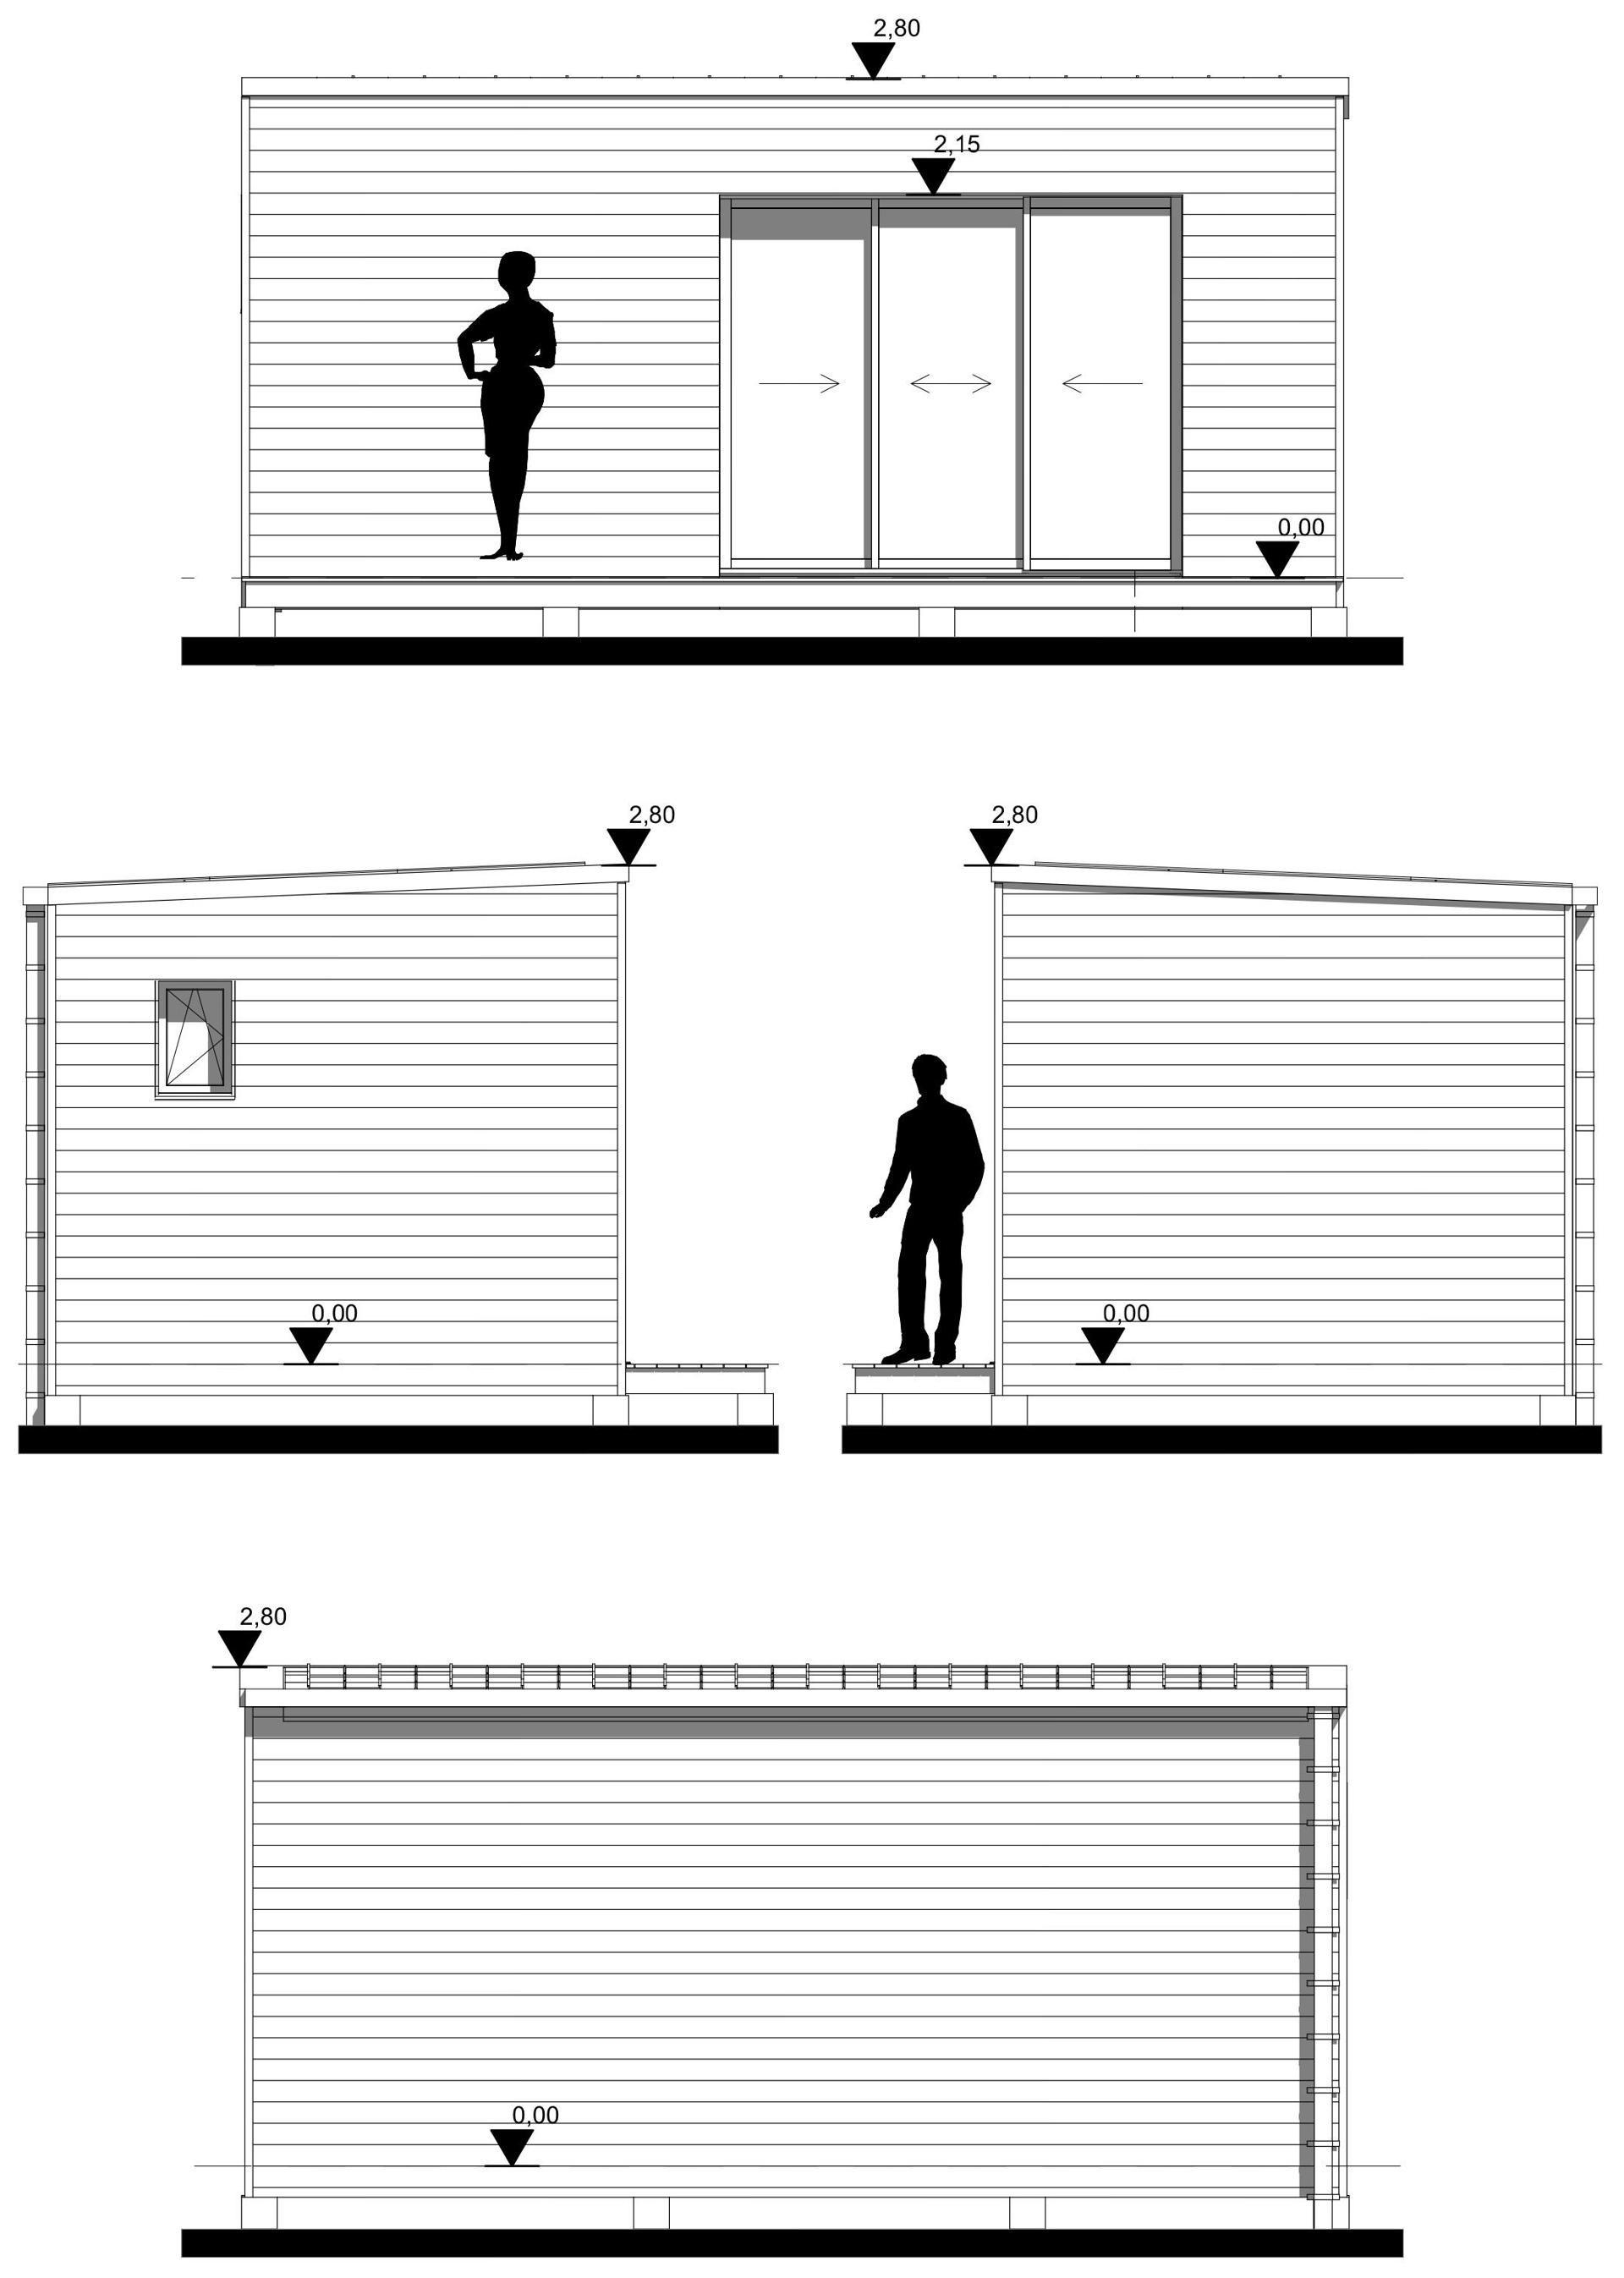 studio de jardin 20m2 plan façades